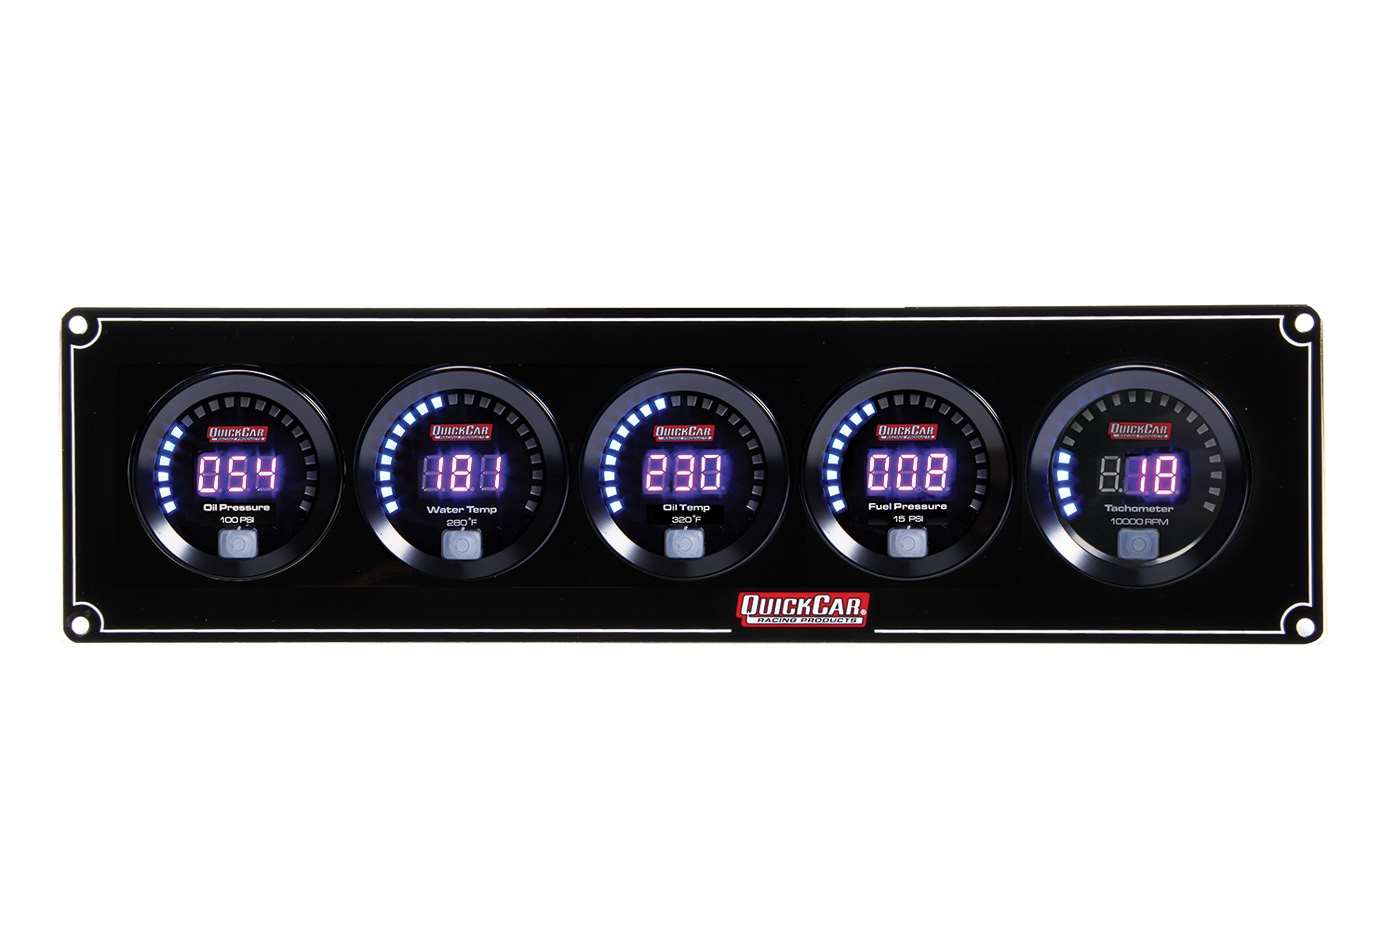 QuickCar 67-4051 Gauge Panel Assembly, Digital, Oil Pressure / Water Temperature / Oil Temperature / Fuel Pressure / Tachometer, Black Face, Kit